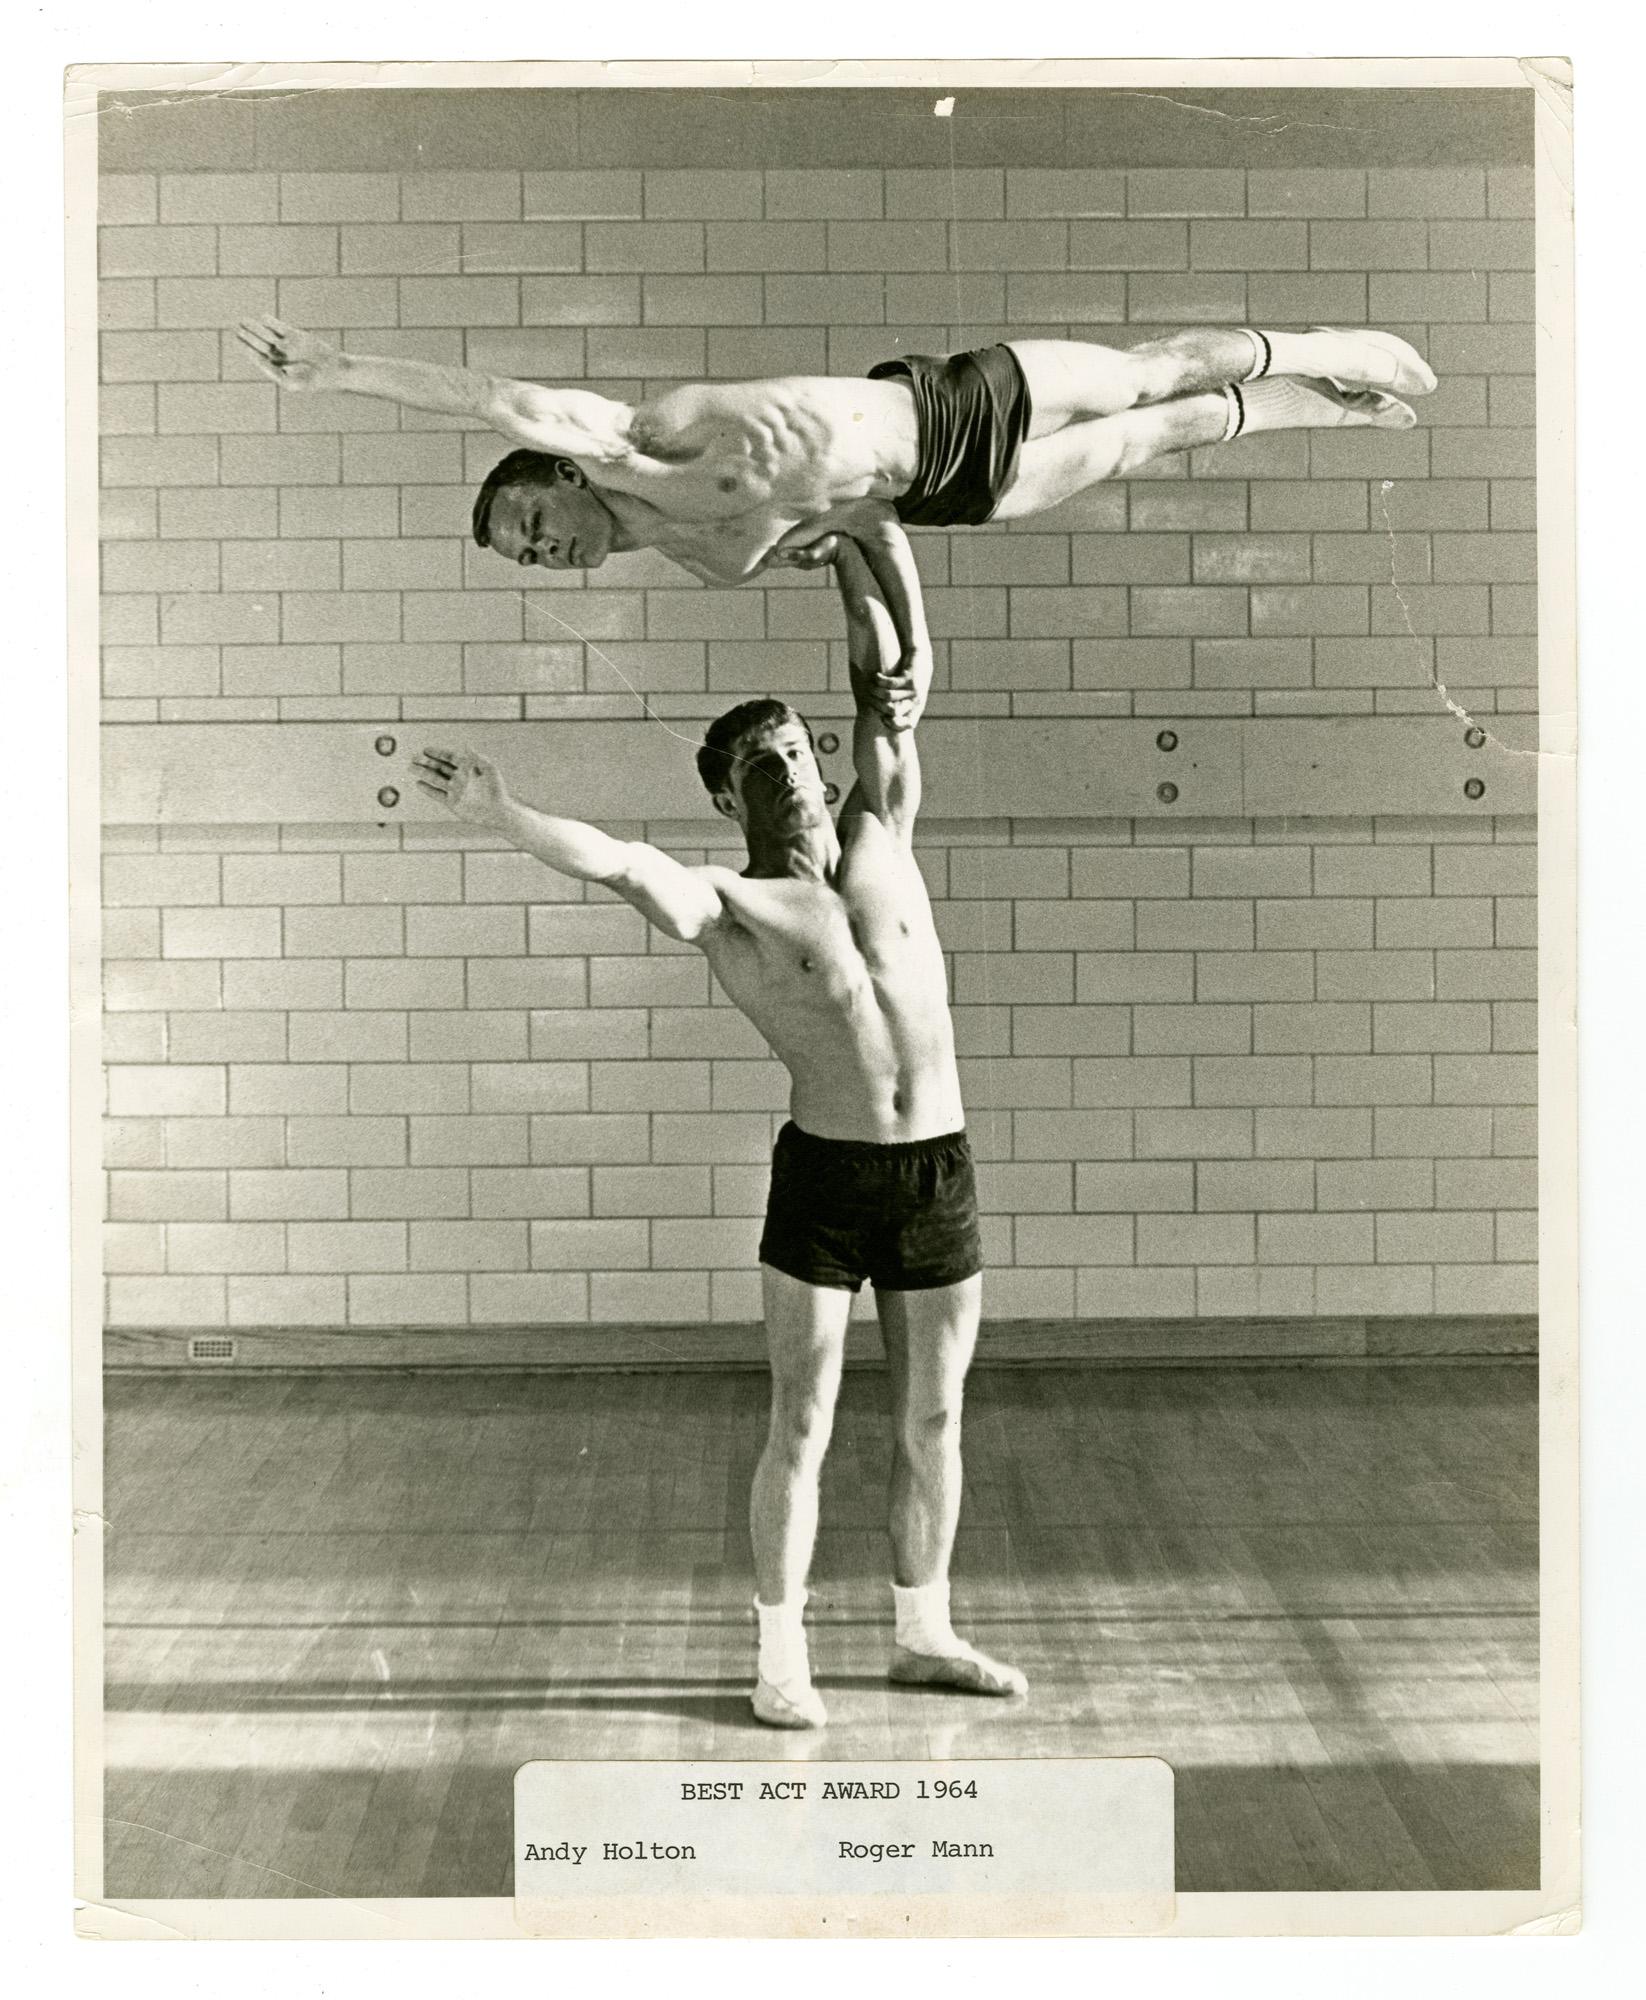 1964 - Men's Doubles Balancing